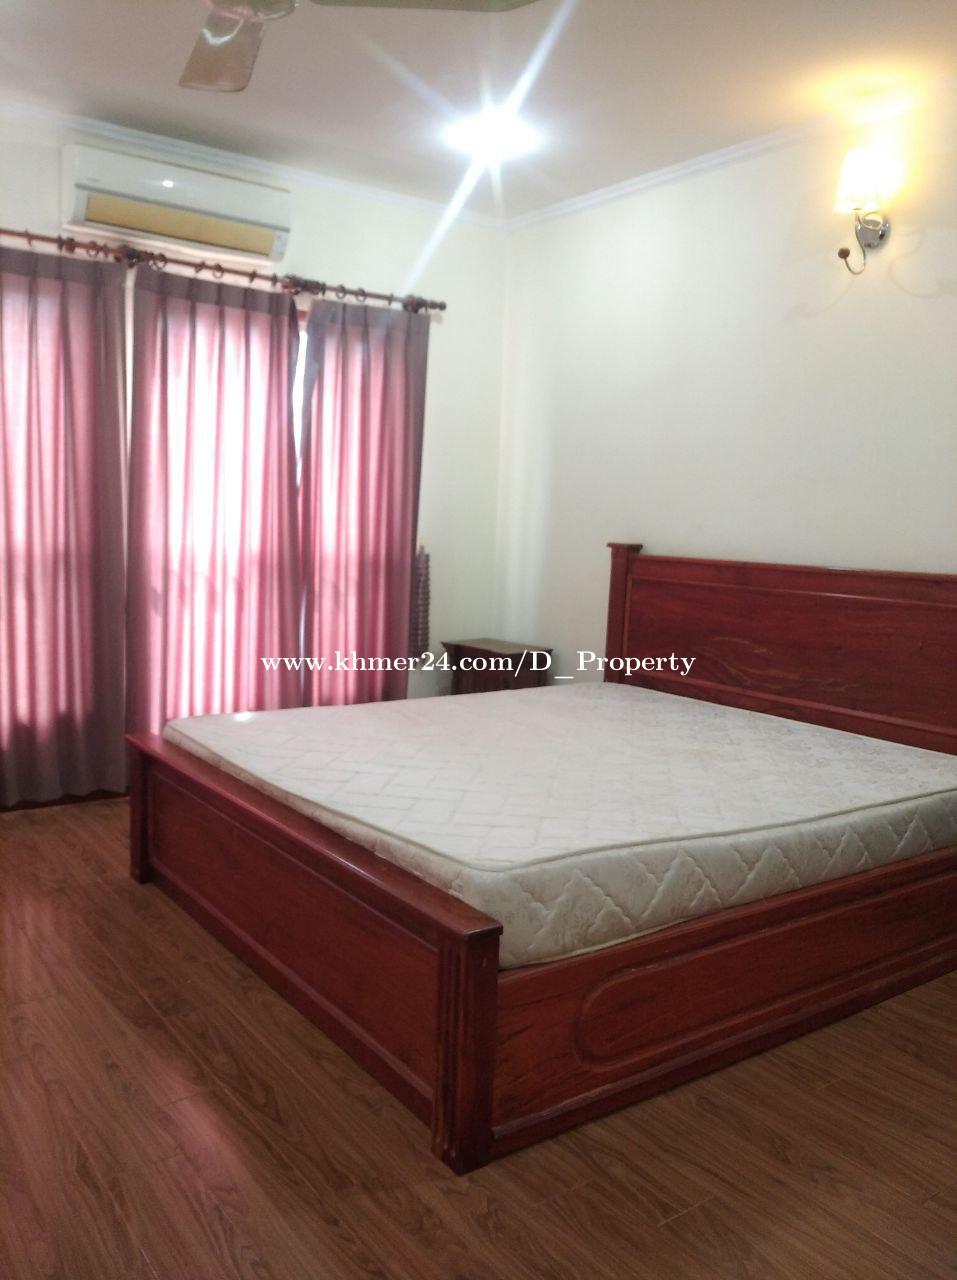 Western Apartment for Rent (1Bedroom; BKK3)